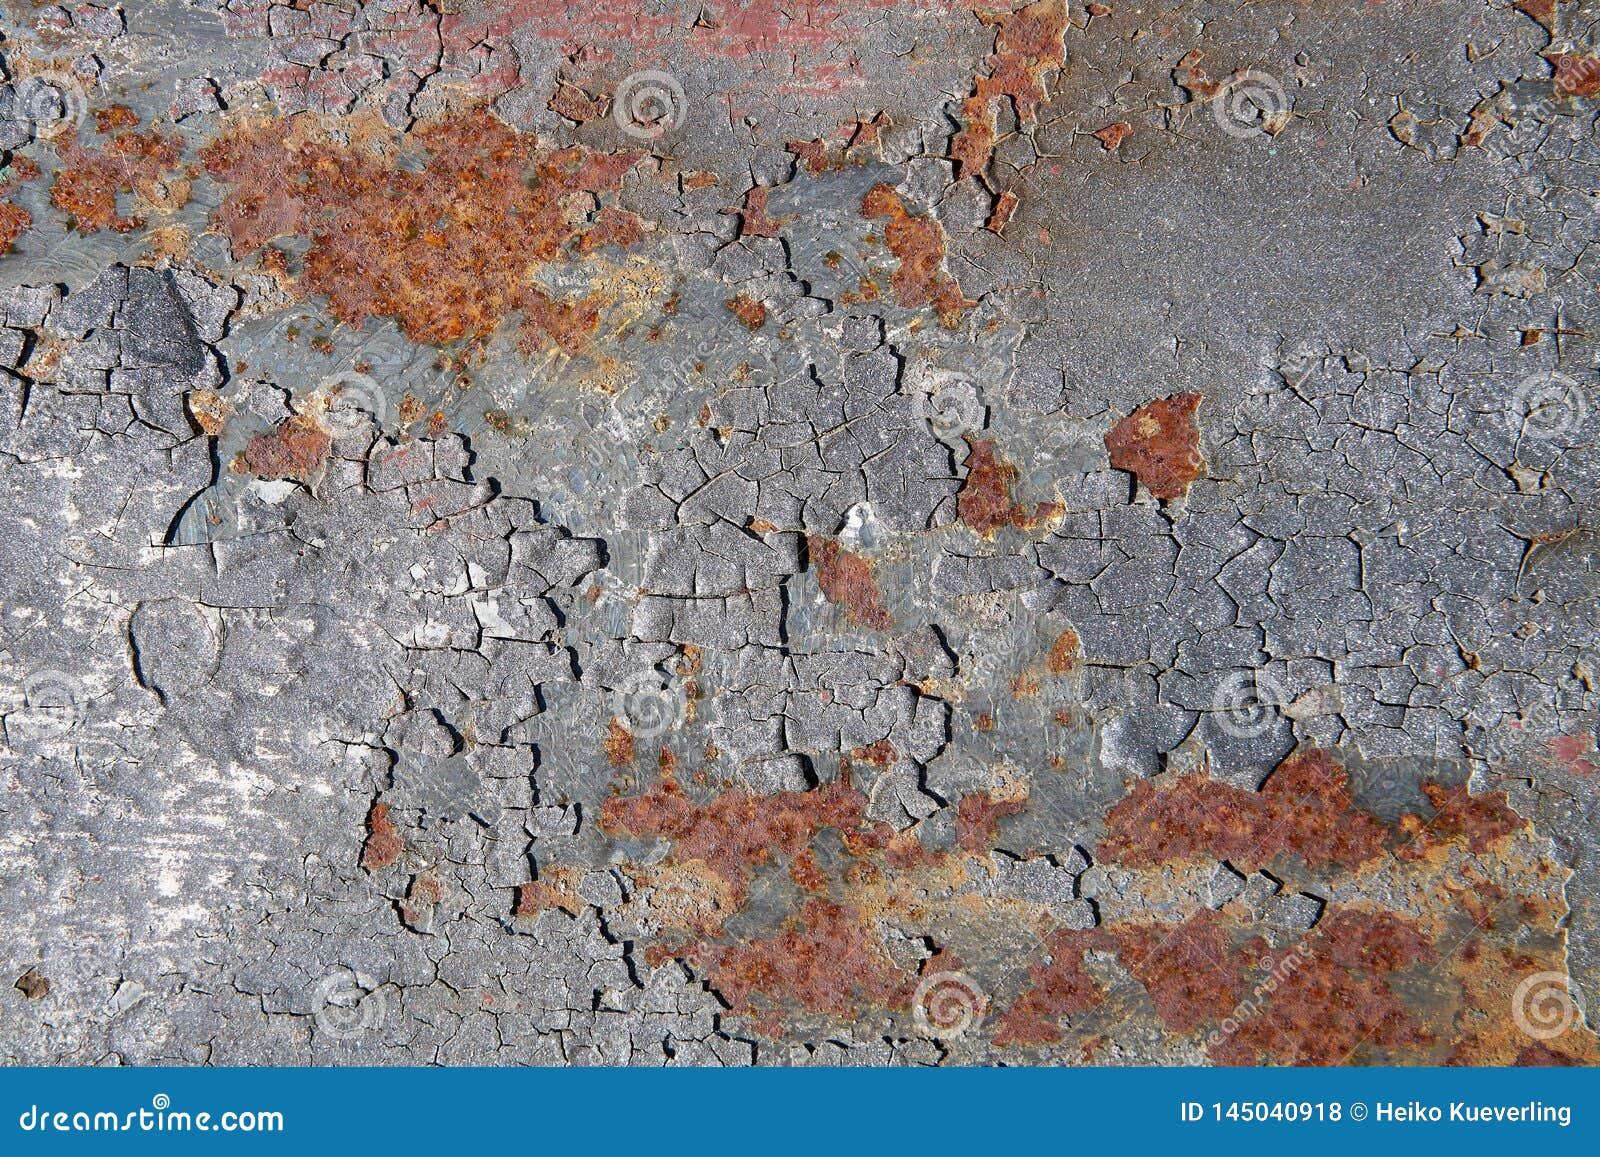 Rusty surface of an old bridge pier